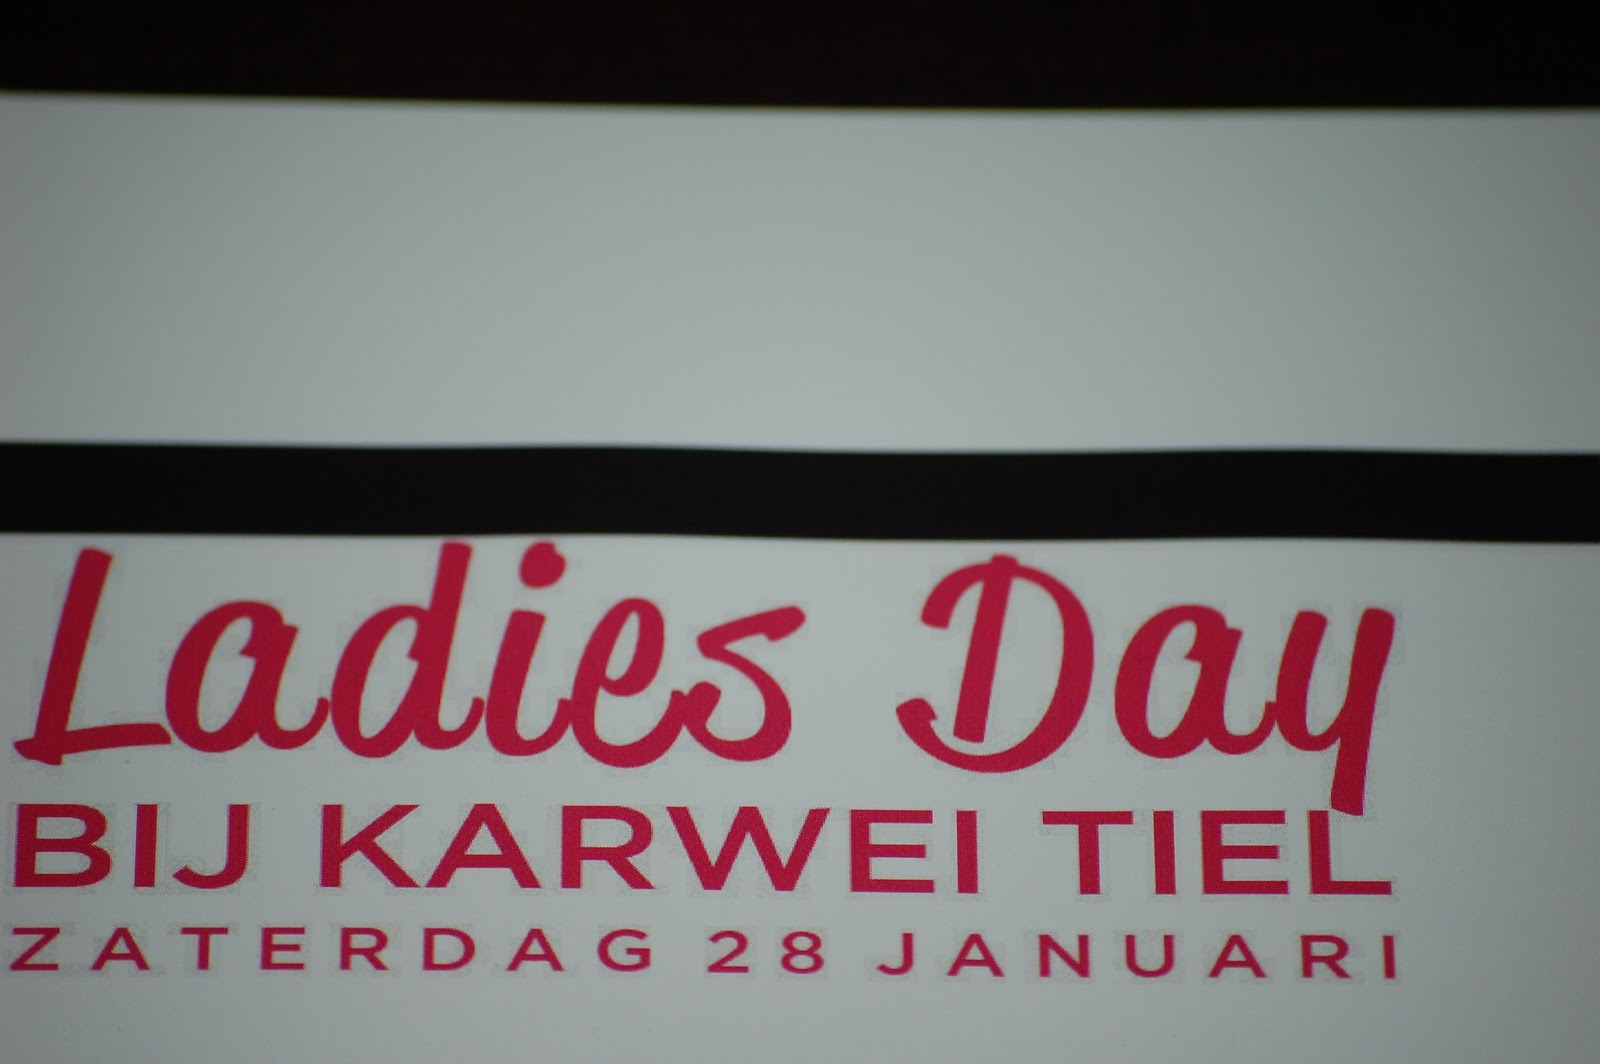 Schilderij Plank Karwei.Karwei Blog Blog Interieur Tips En Inspiratie Schilderij Karwei